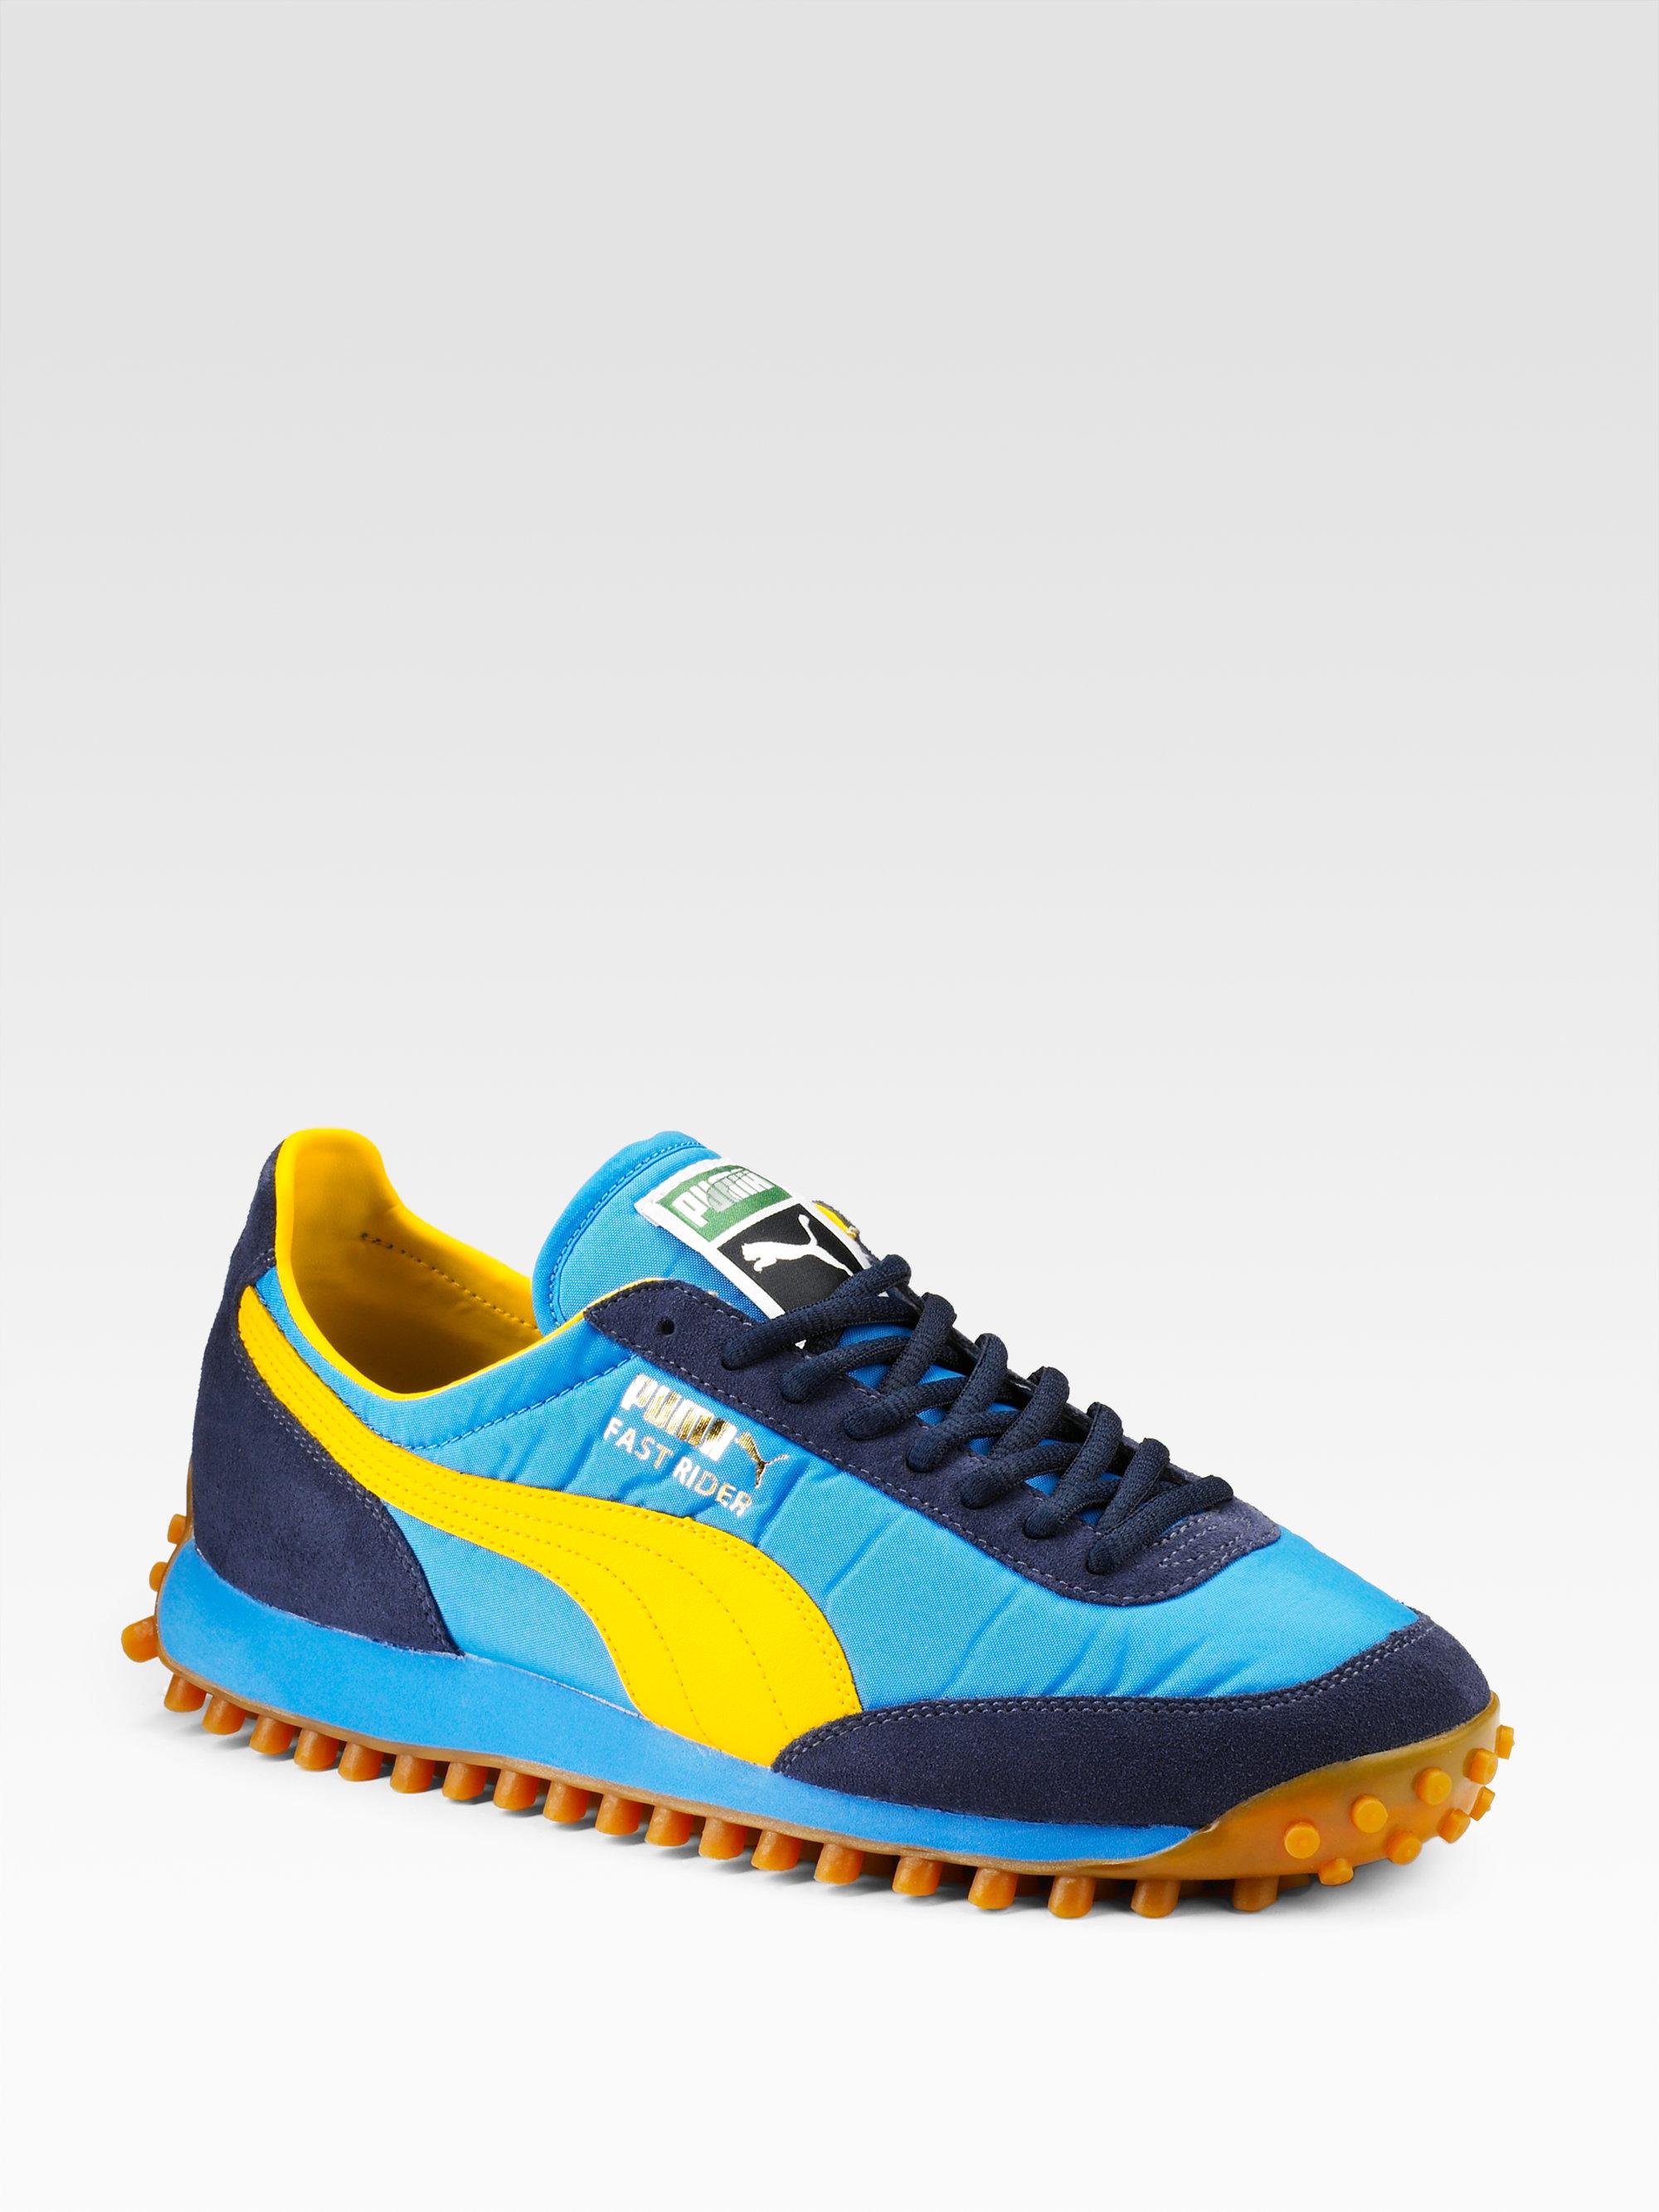 77dec366507 Lyst - PUMA Fast Rider Sneakers in Blue for Men